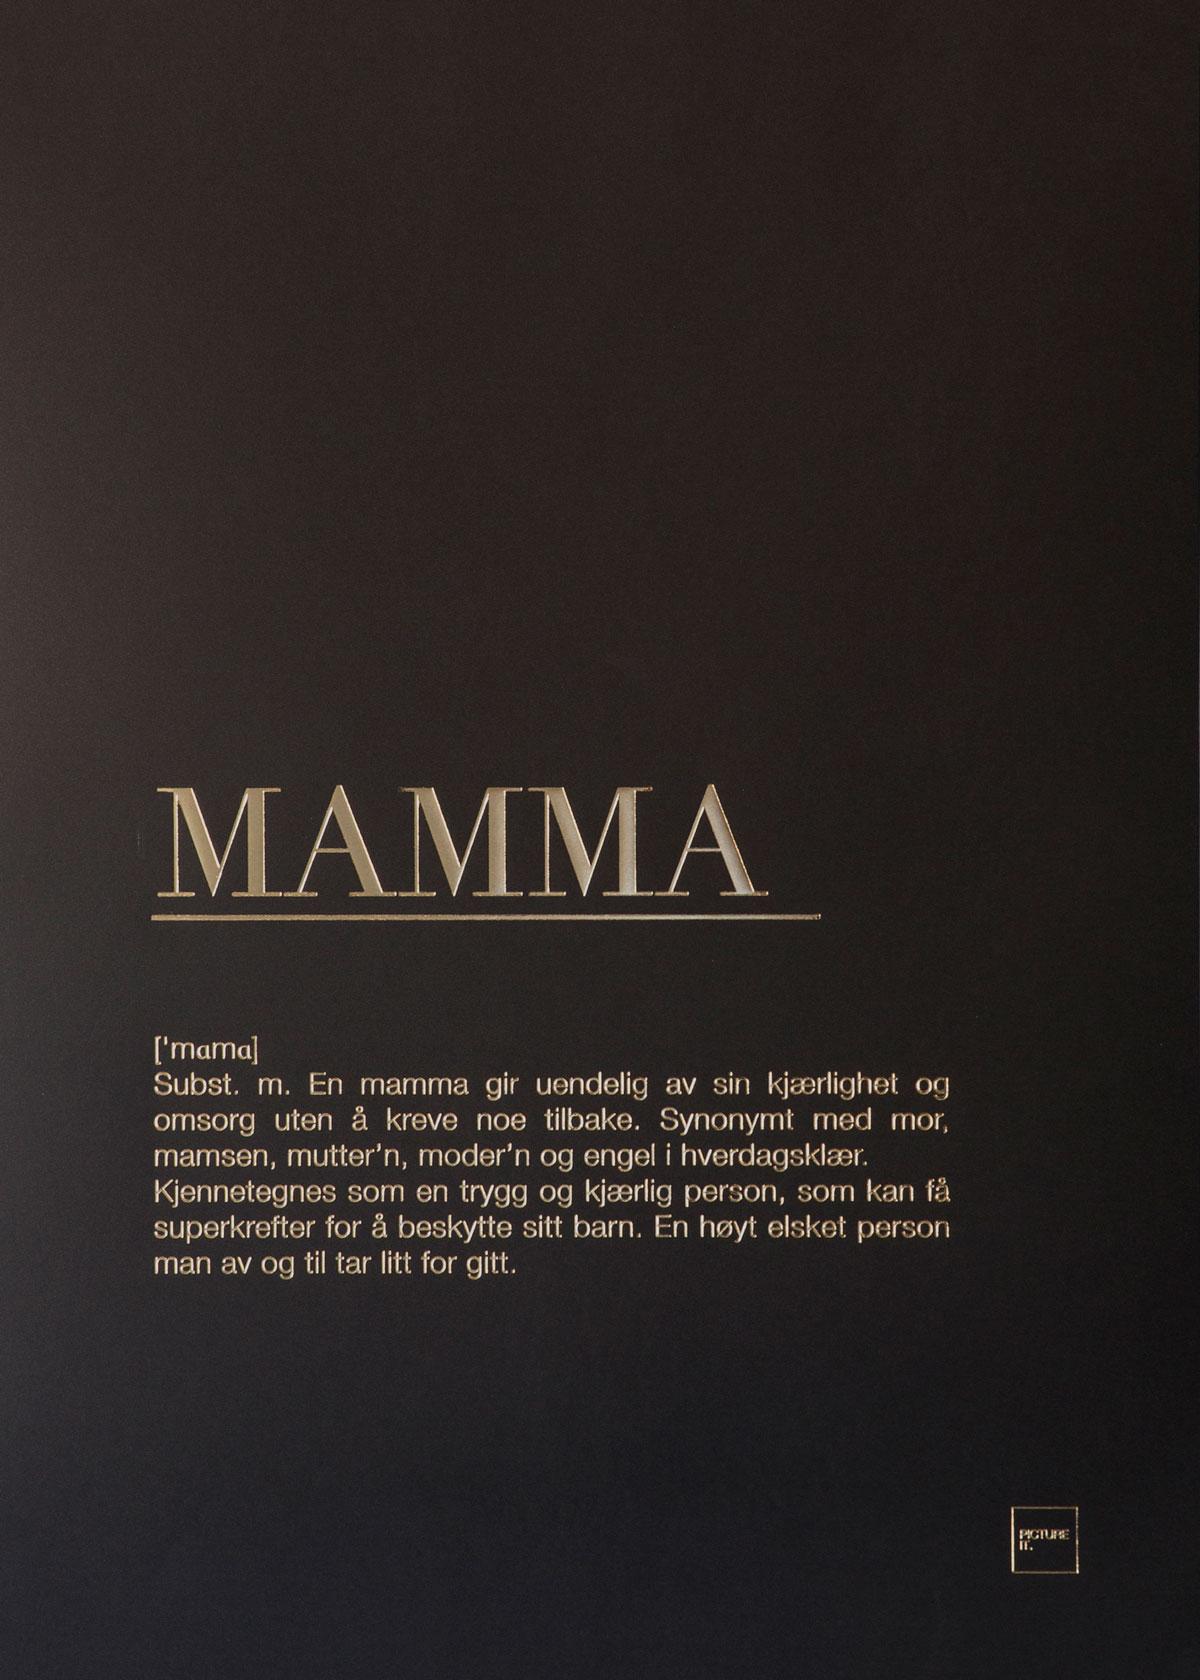 MAMMA gull poster 50x70cm